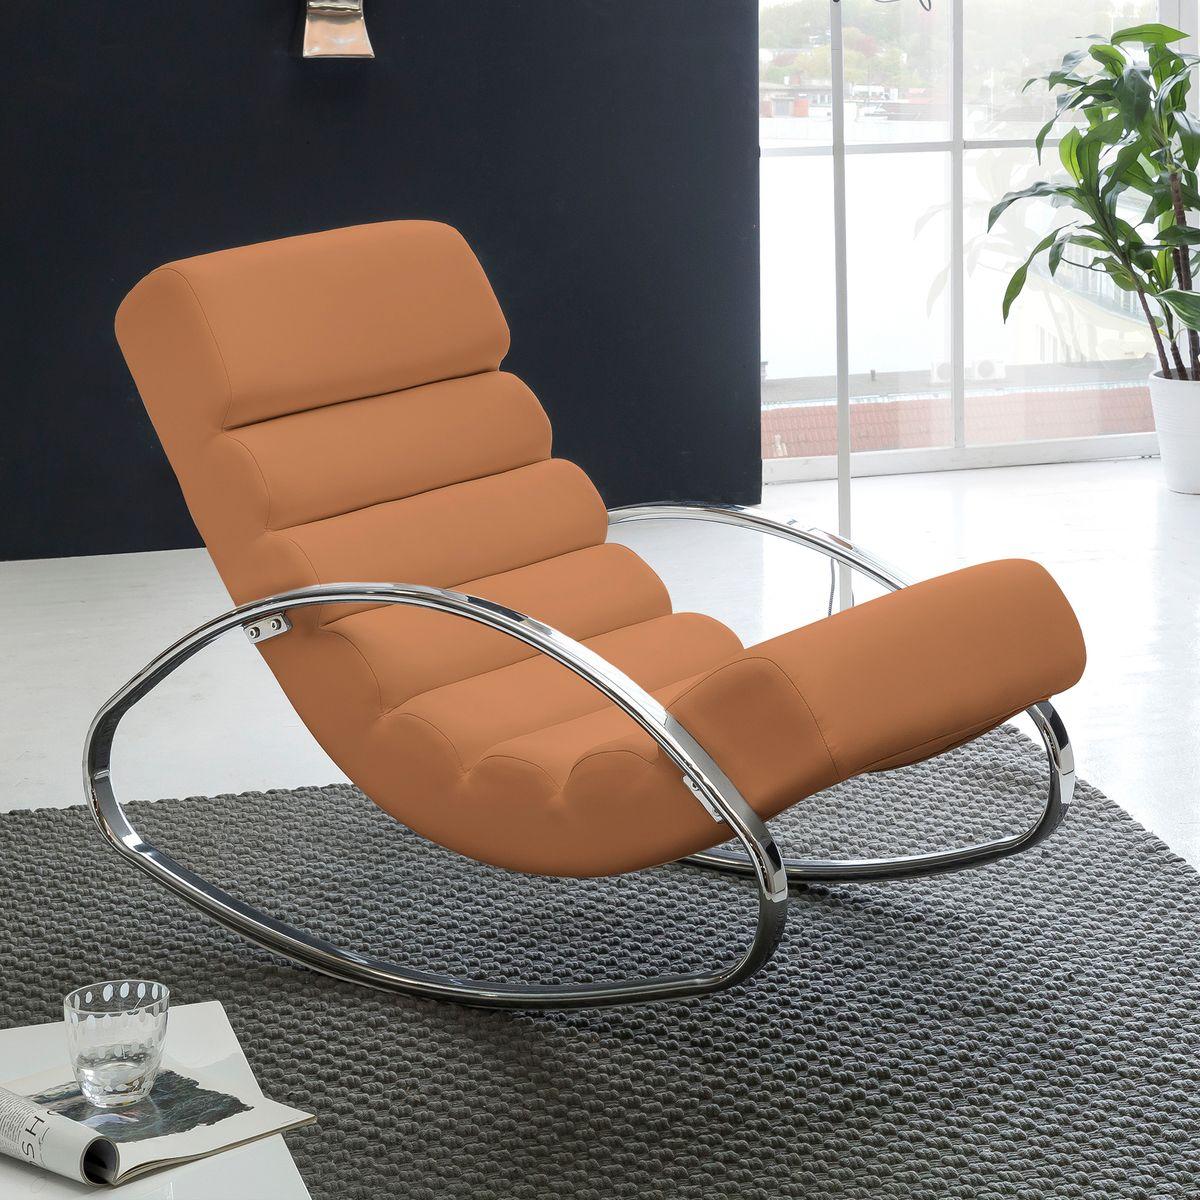 wohnling relaxliege sessel fernsehsessel farbe braun relaxsessel design schaukelstuhl wippstuhl. Black Bedroom Furniture Sets. Home Design Ideas